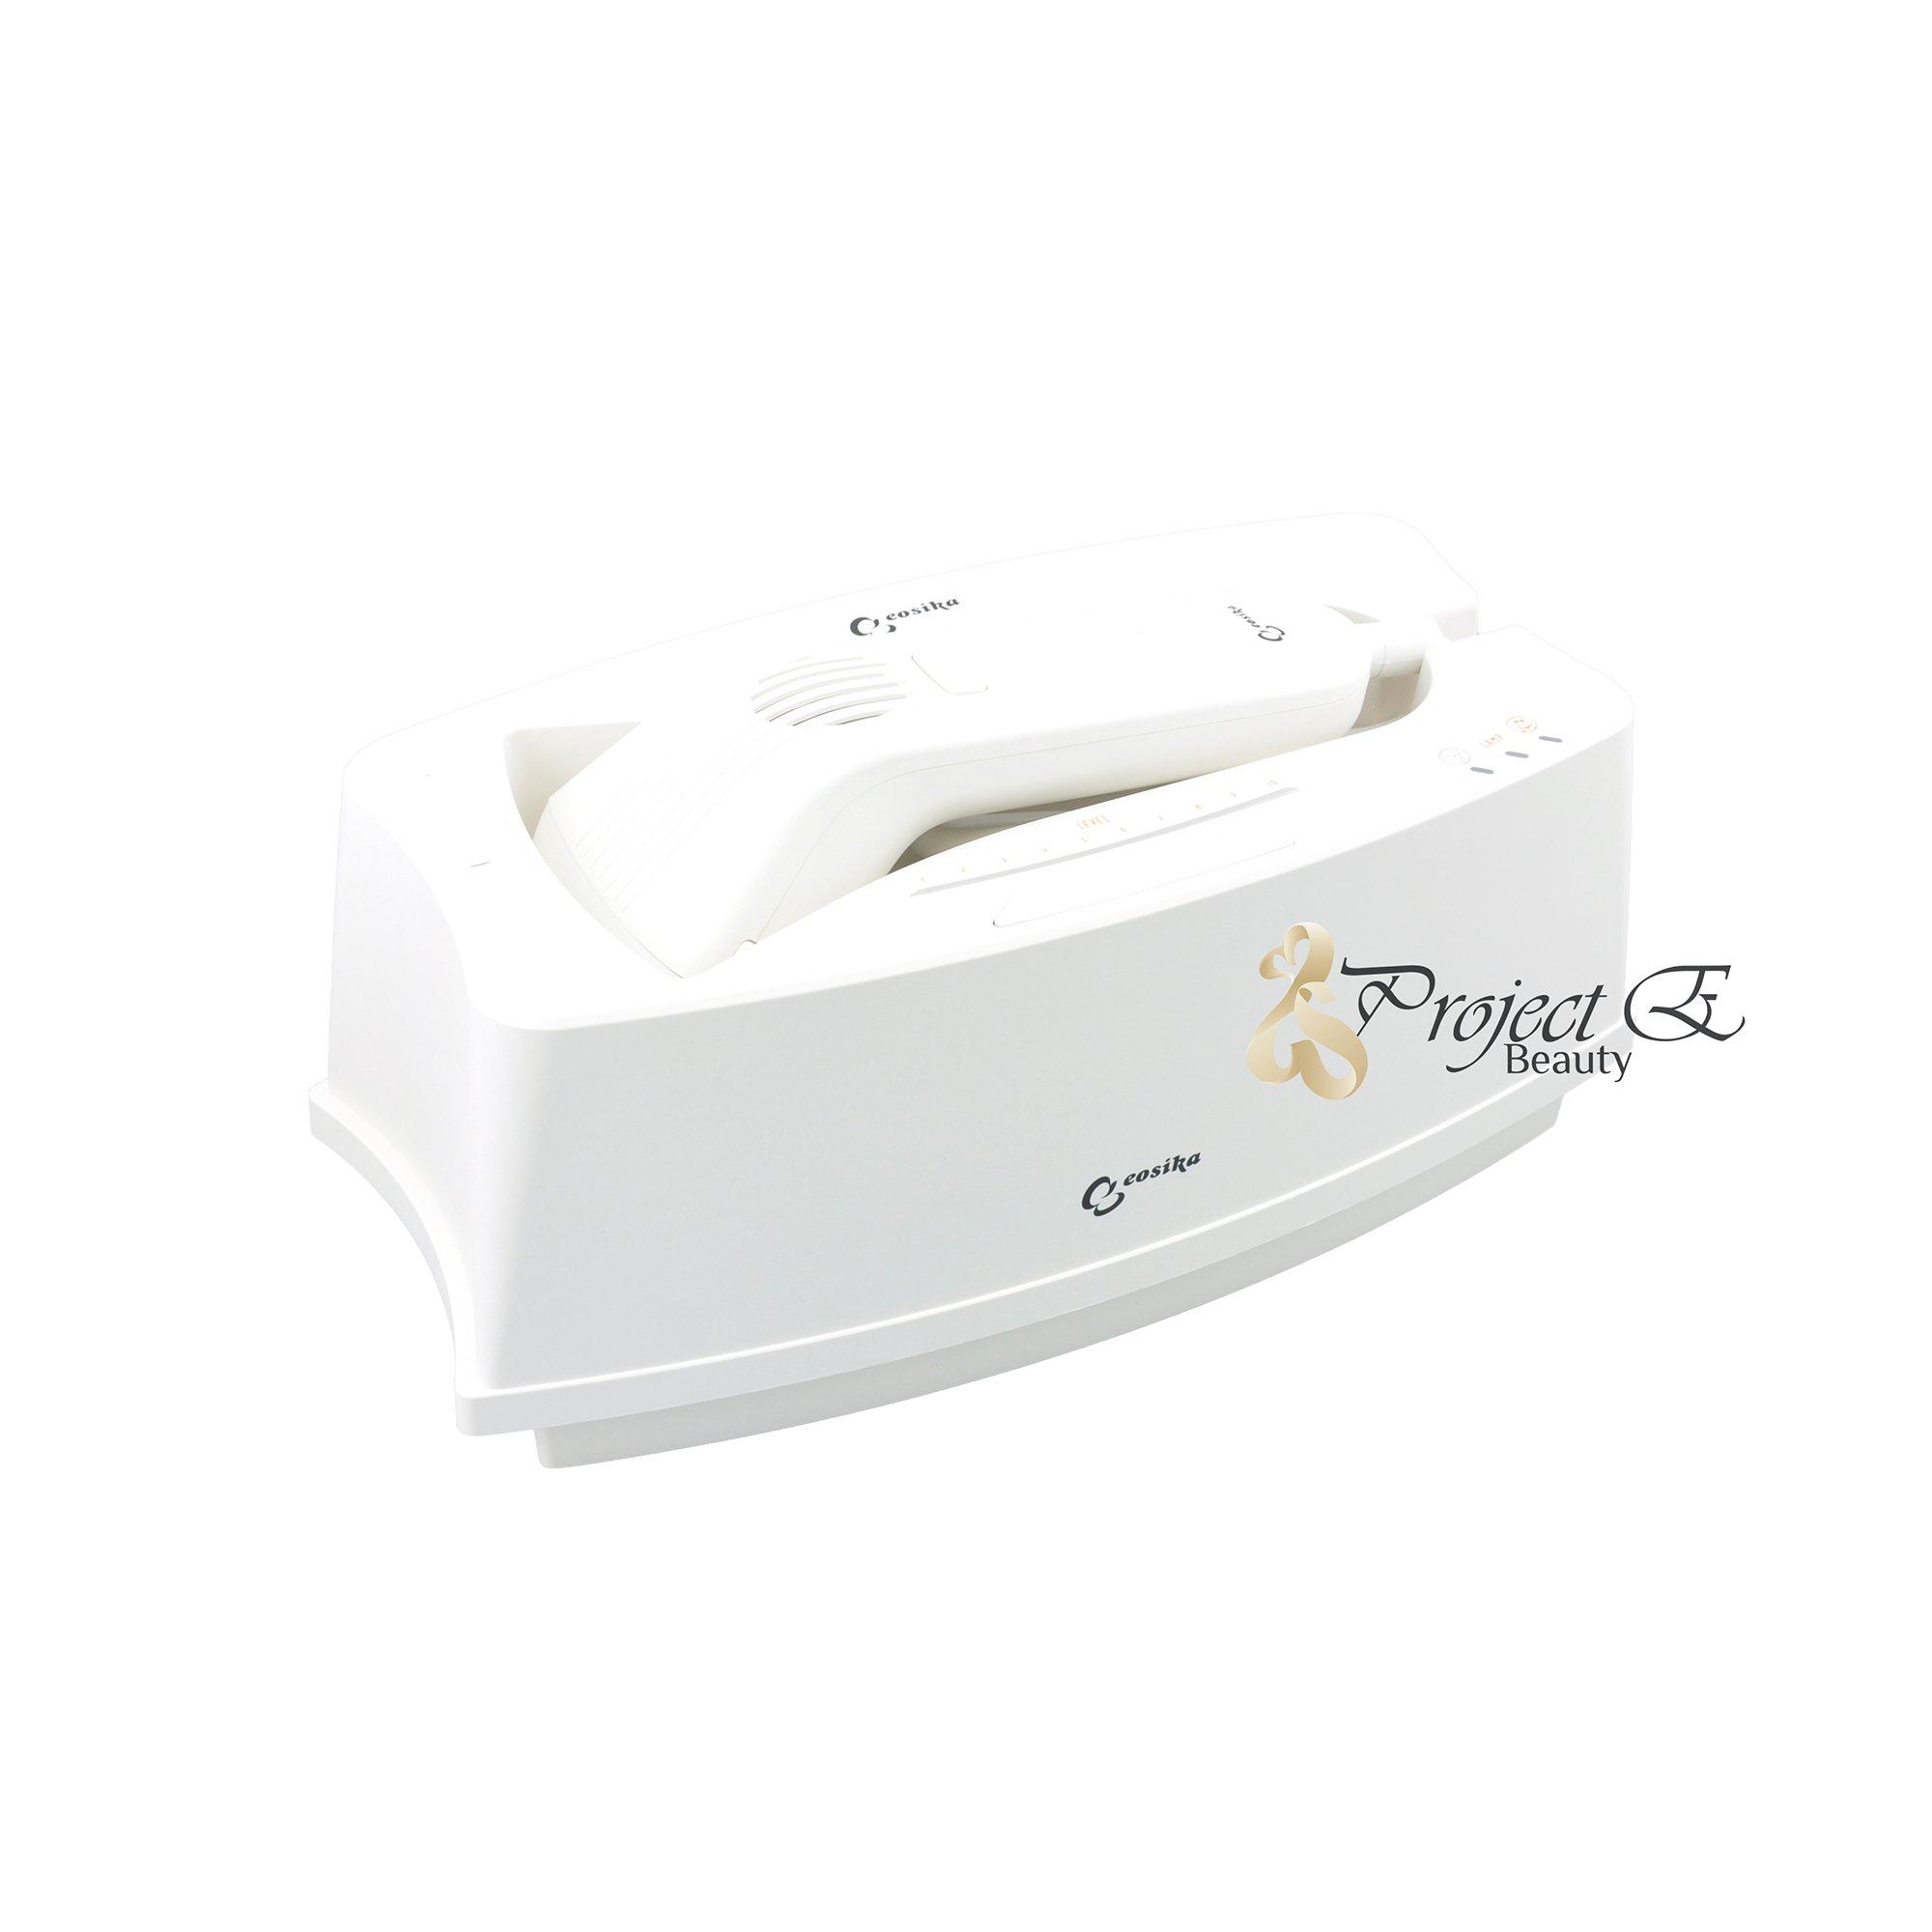 Project E Beauty Pro Mini Laser Hair Removal IPL + Rejuvenation Skin Care Home Use Salon Machine by Project E Beauty (Image #7)